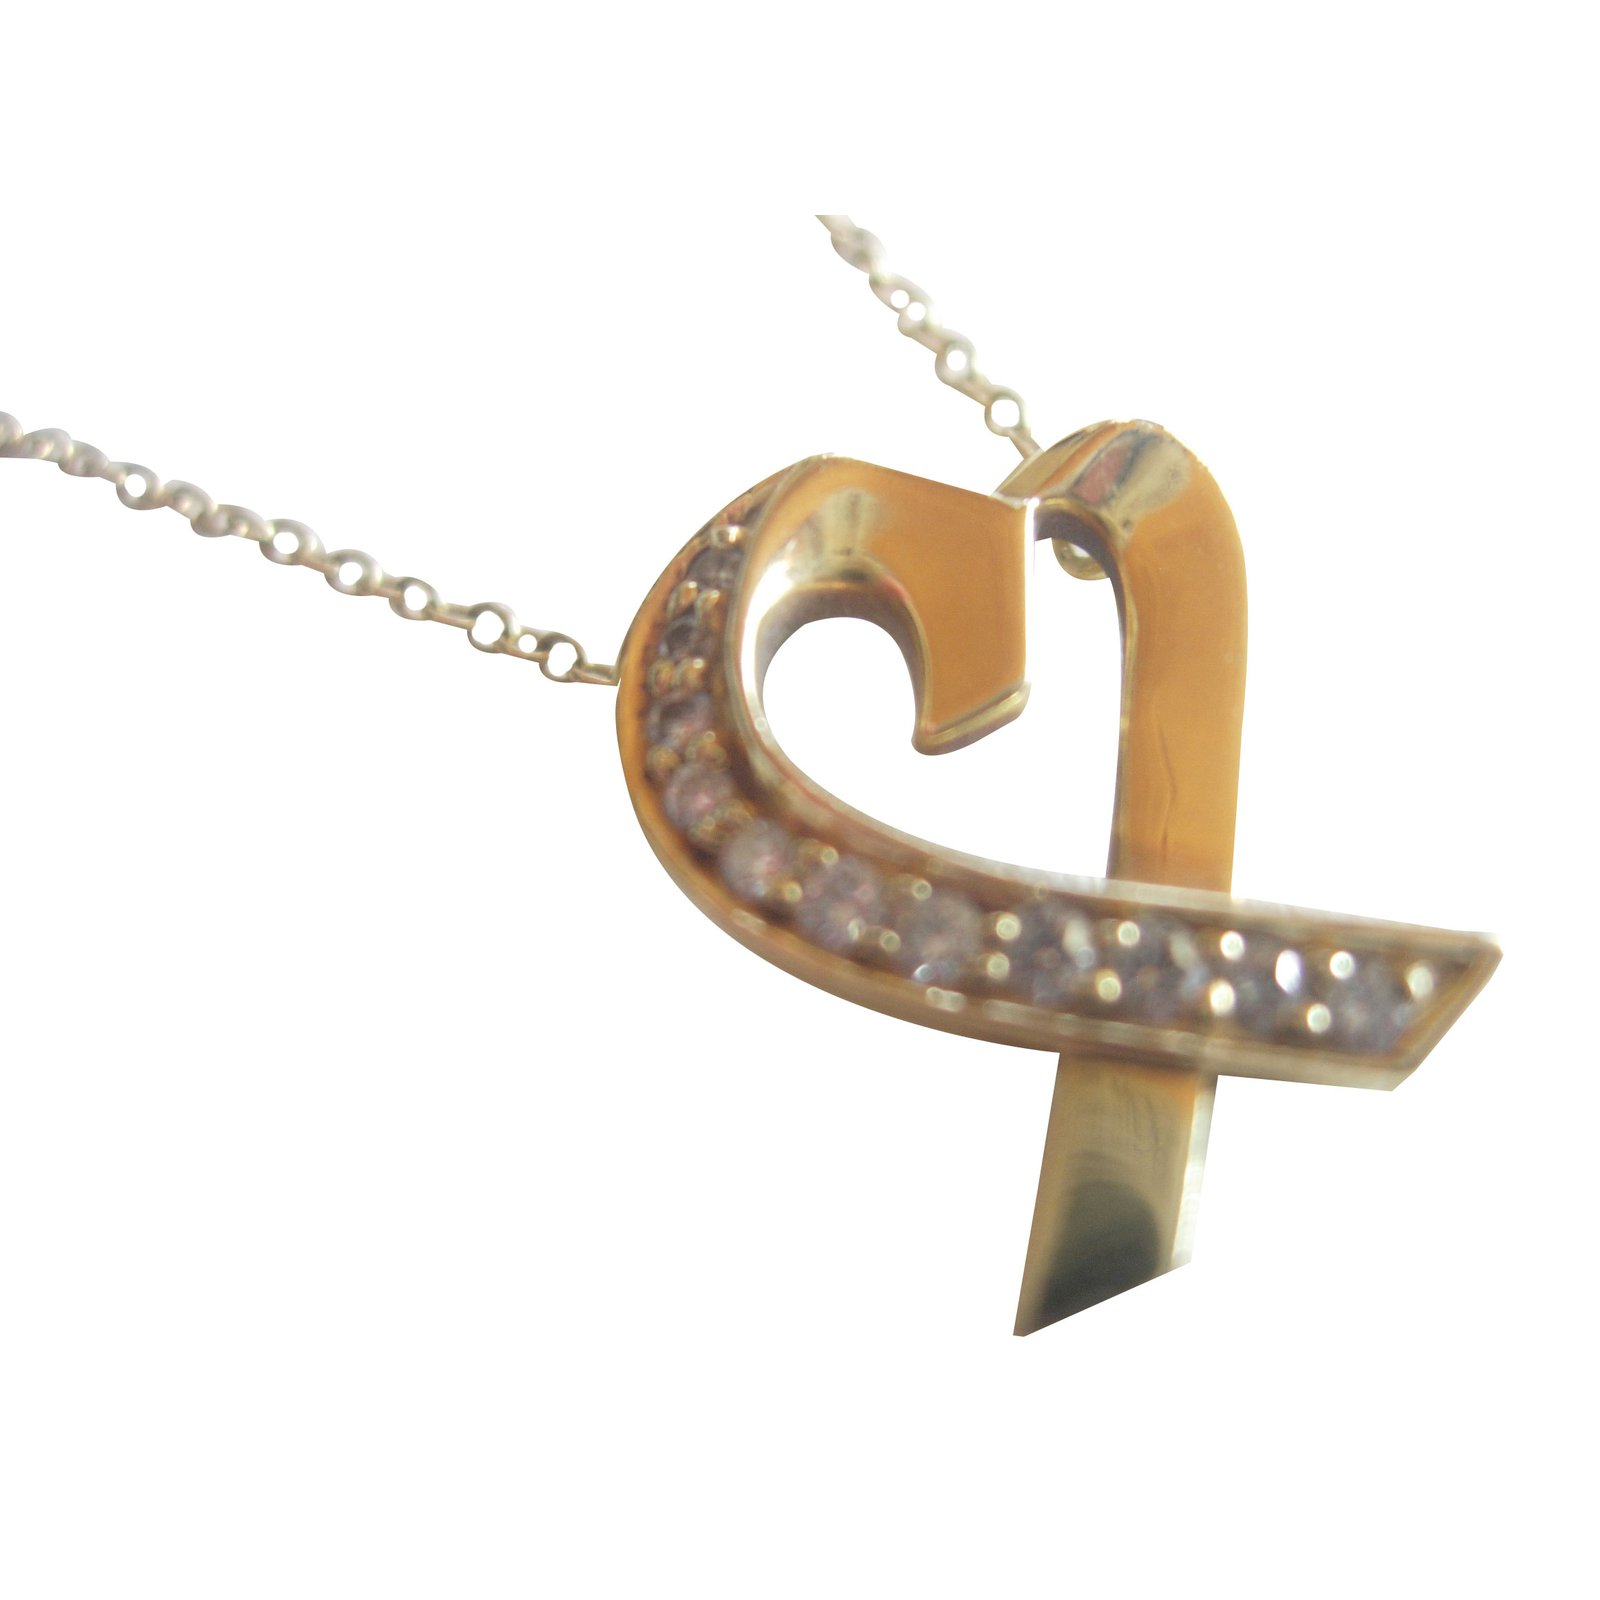 Tiffany co loving heart pendant necklaces yellow gold golden ref tiffany co loving heart pendant necklaces yellow gold golden ref35372 aloadofball Images